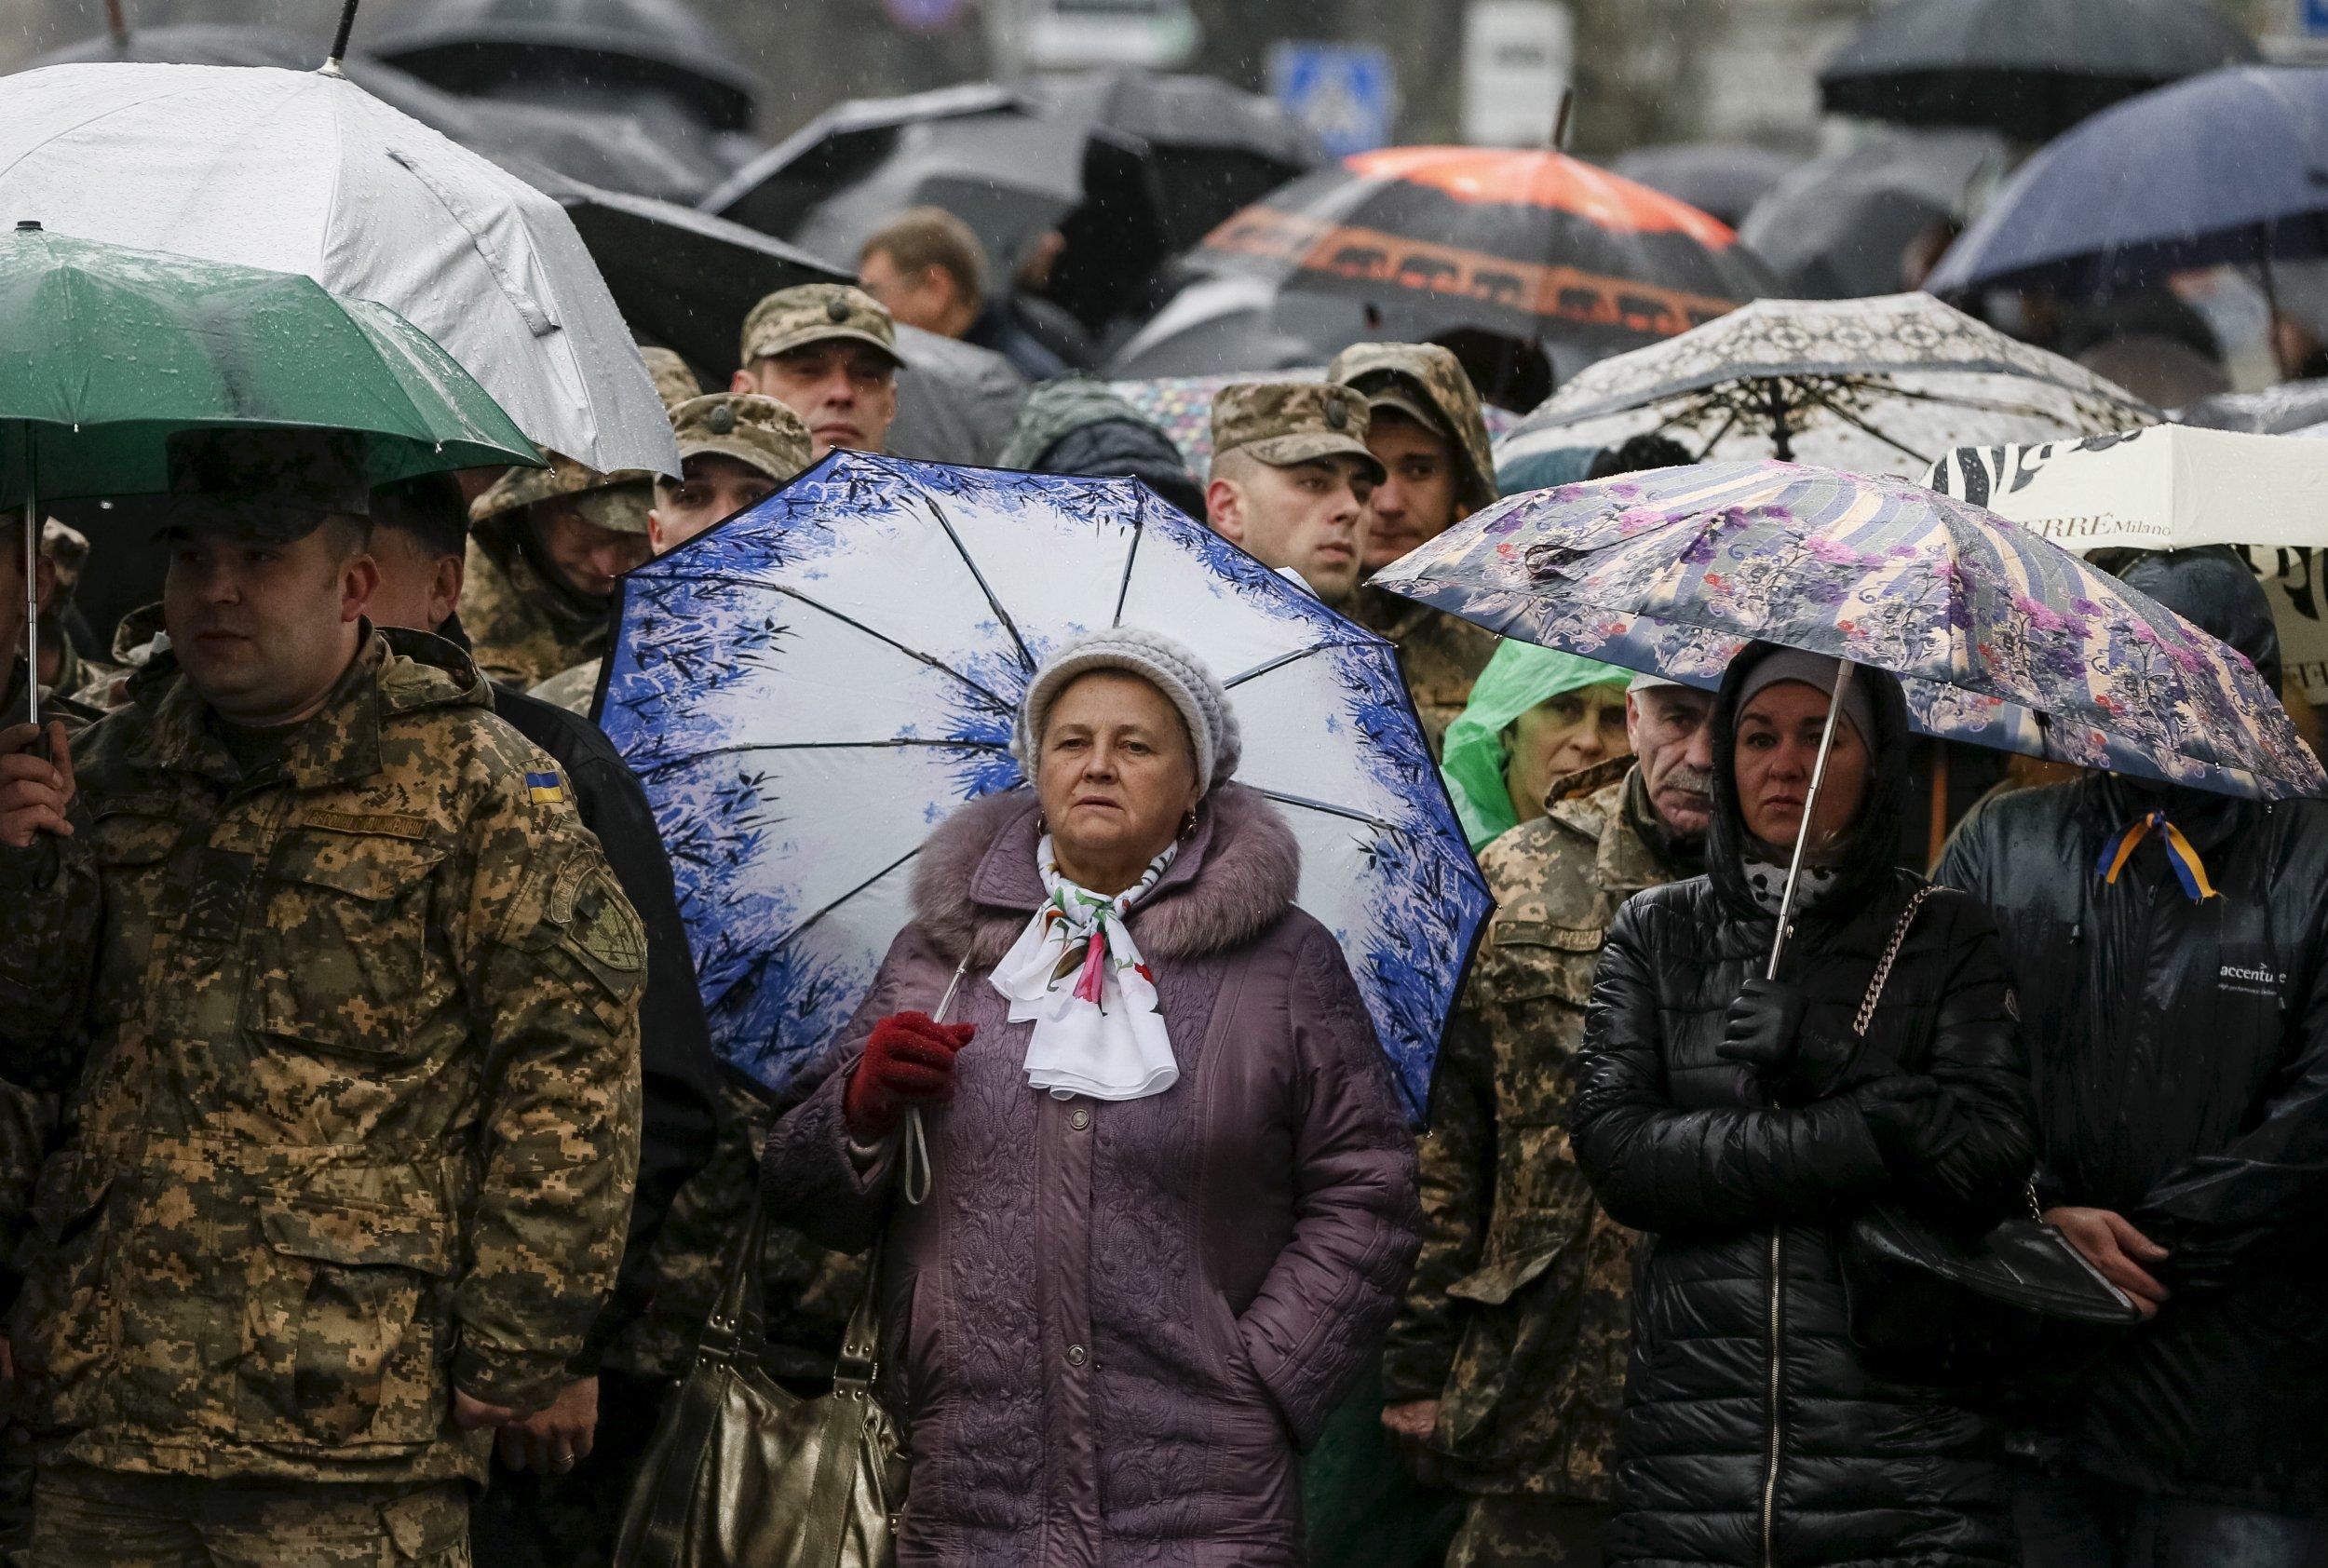 0105_Ukraine_Gallup_Life